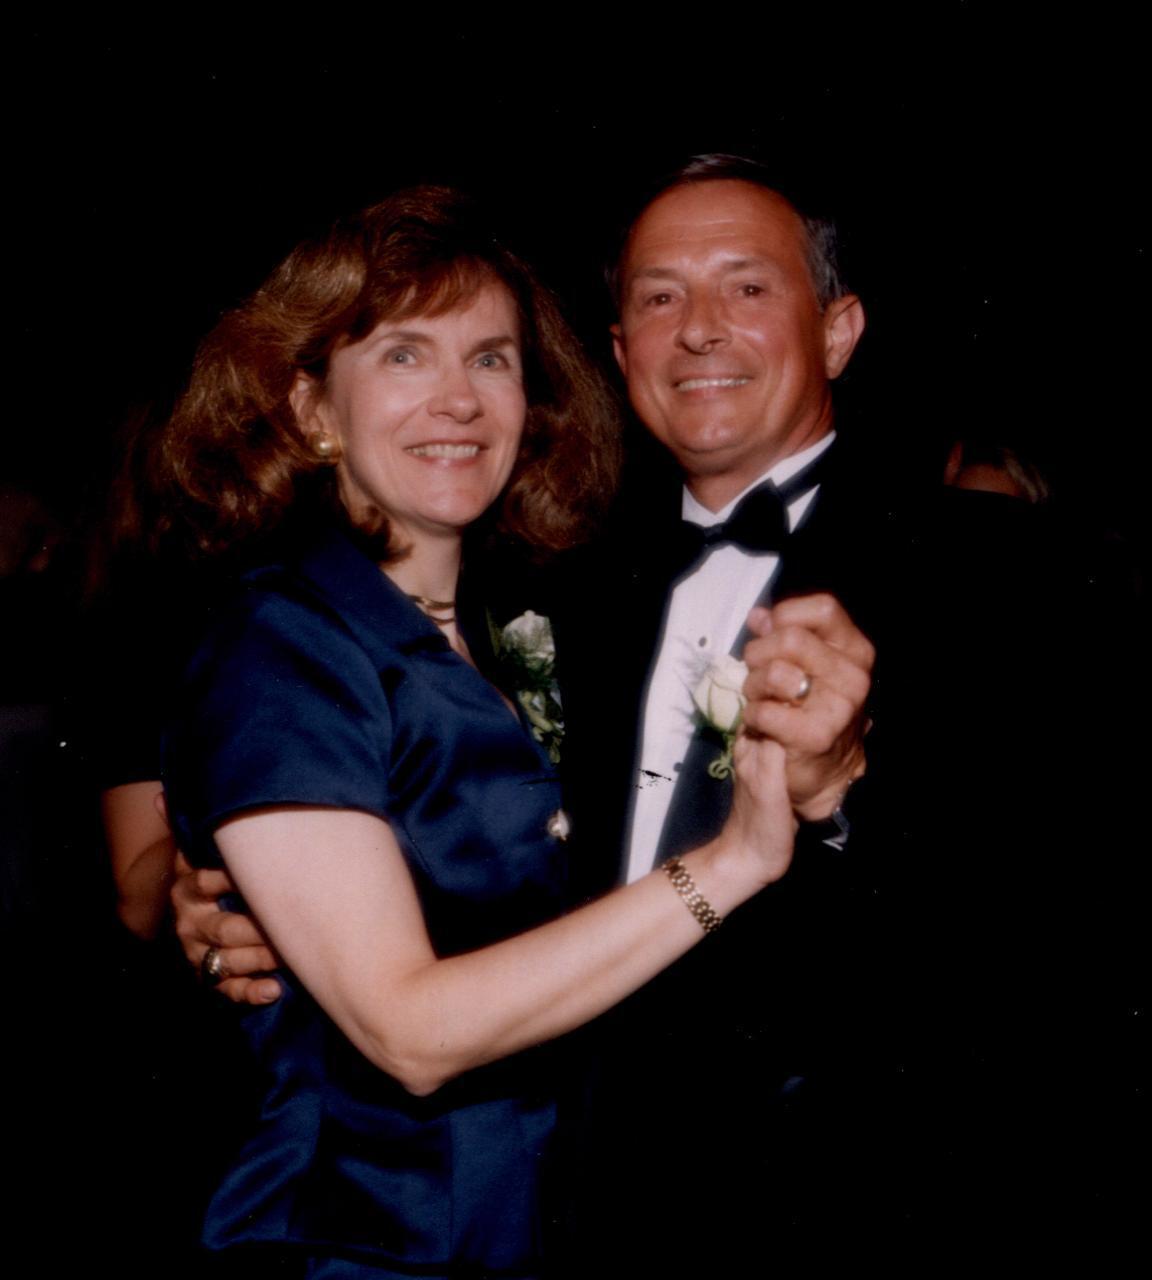 Paula Kollstedt and her husband, Steve, who died in 2014 from Alzheimer's.